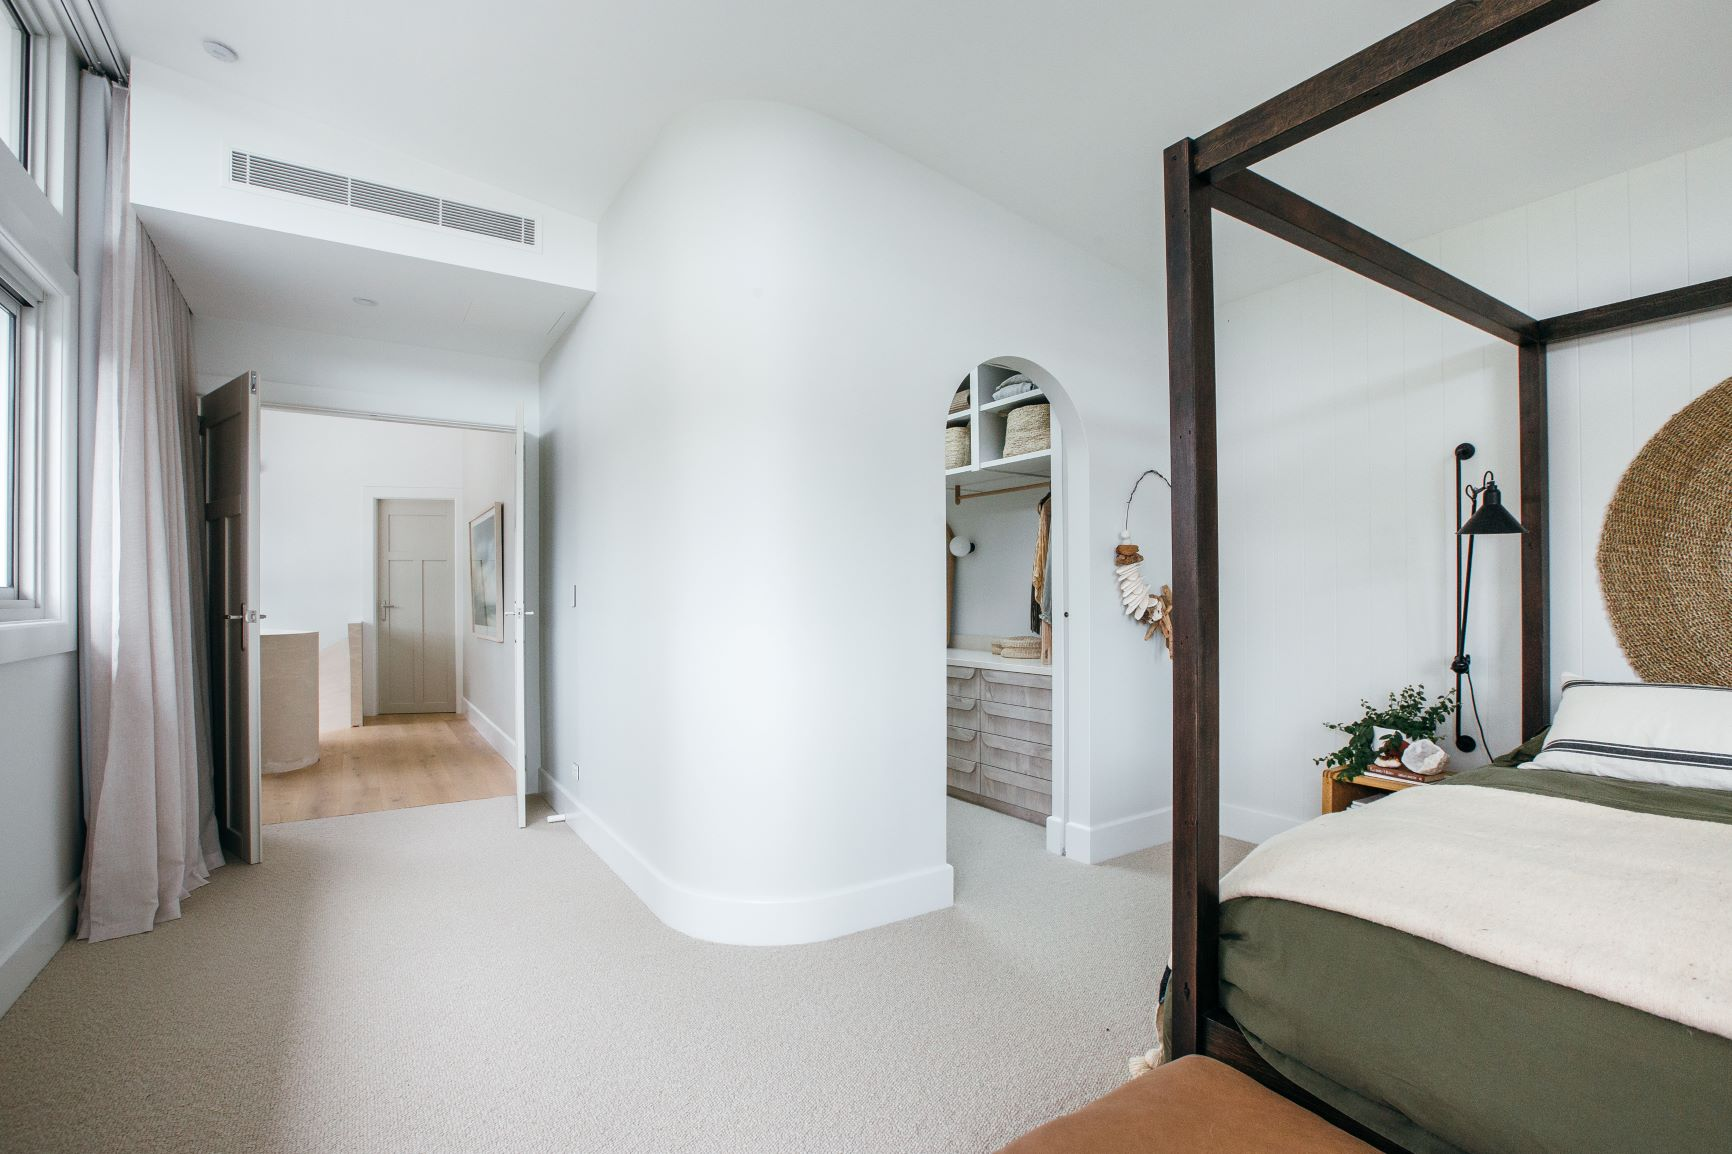 From Australian Coastal style to a Mediterranean villa